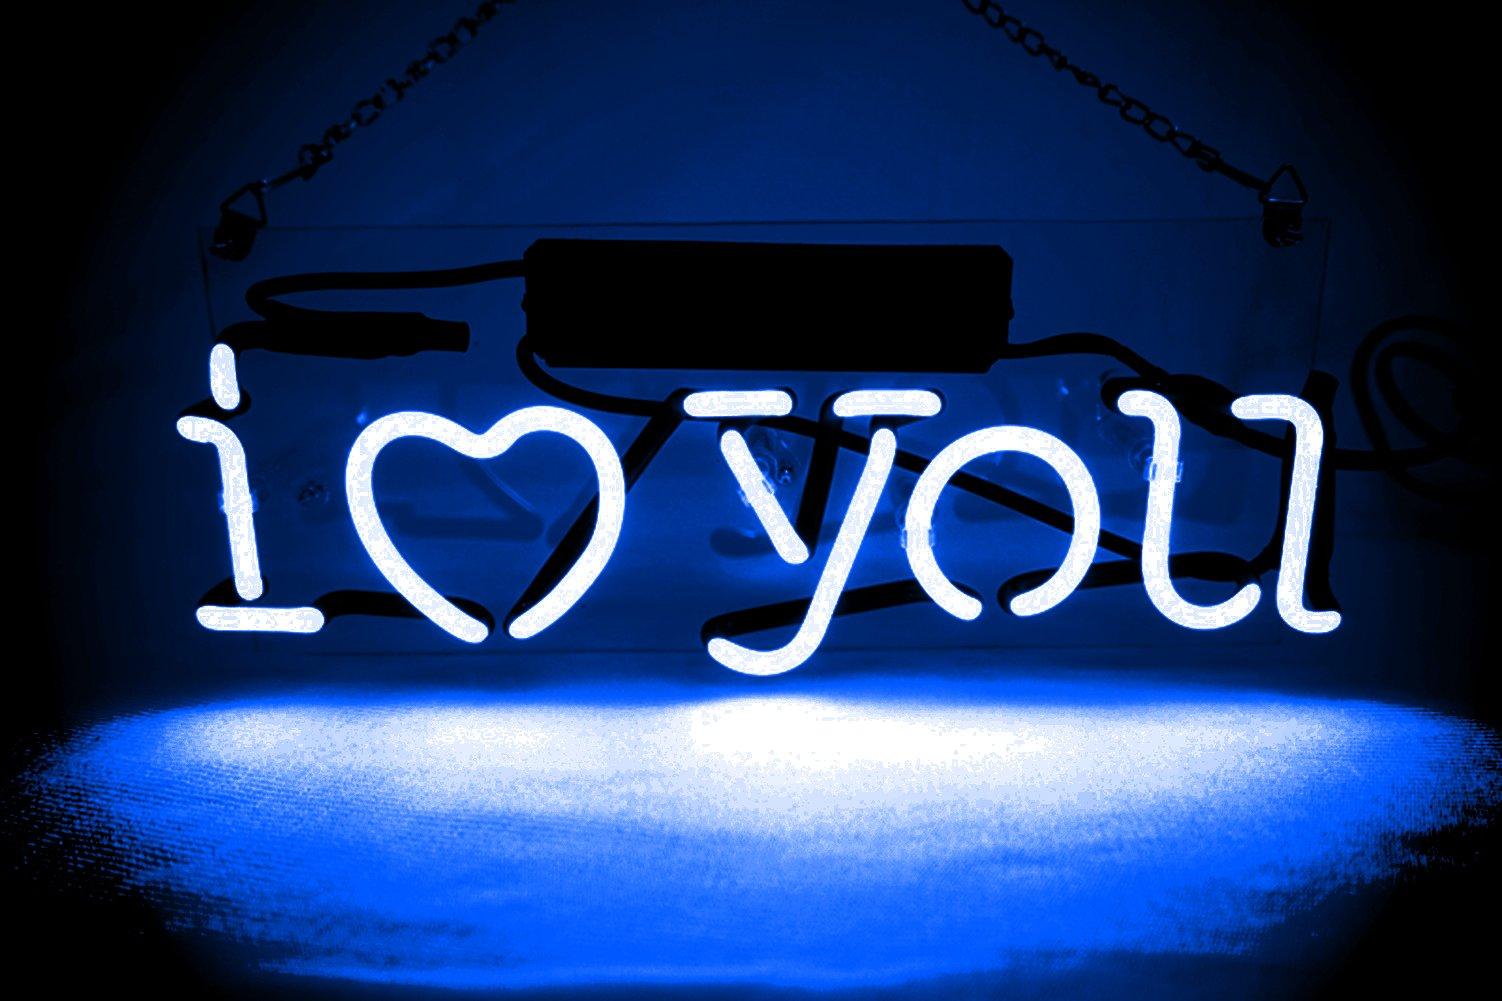 Night Lights Lamp Neon Wall Signs Glass Decorative Lights Handmade Custom for Kids Girls Adults Bedroom Blue I LOVE YOU